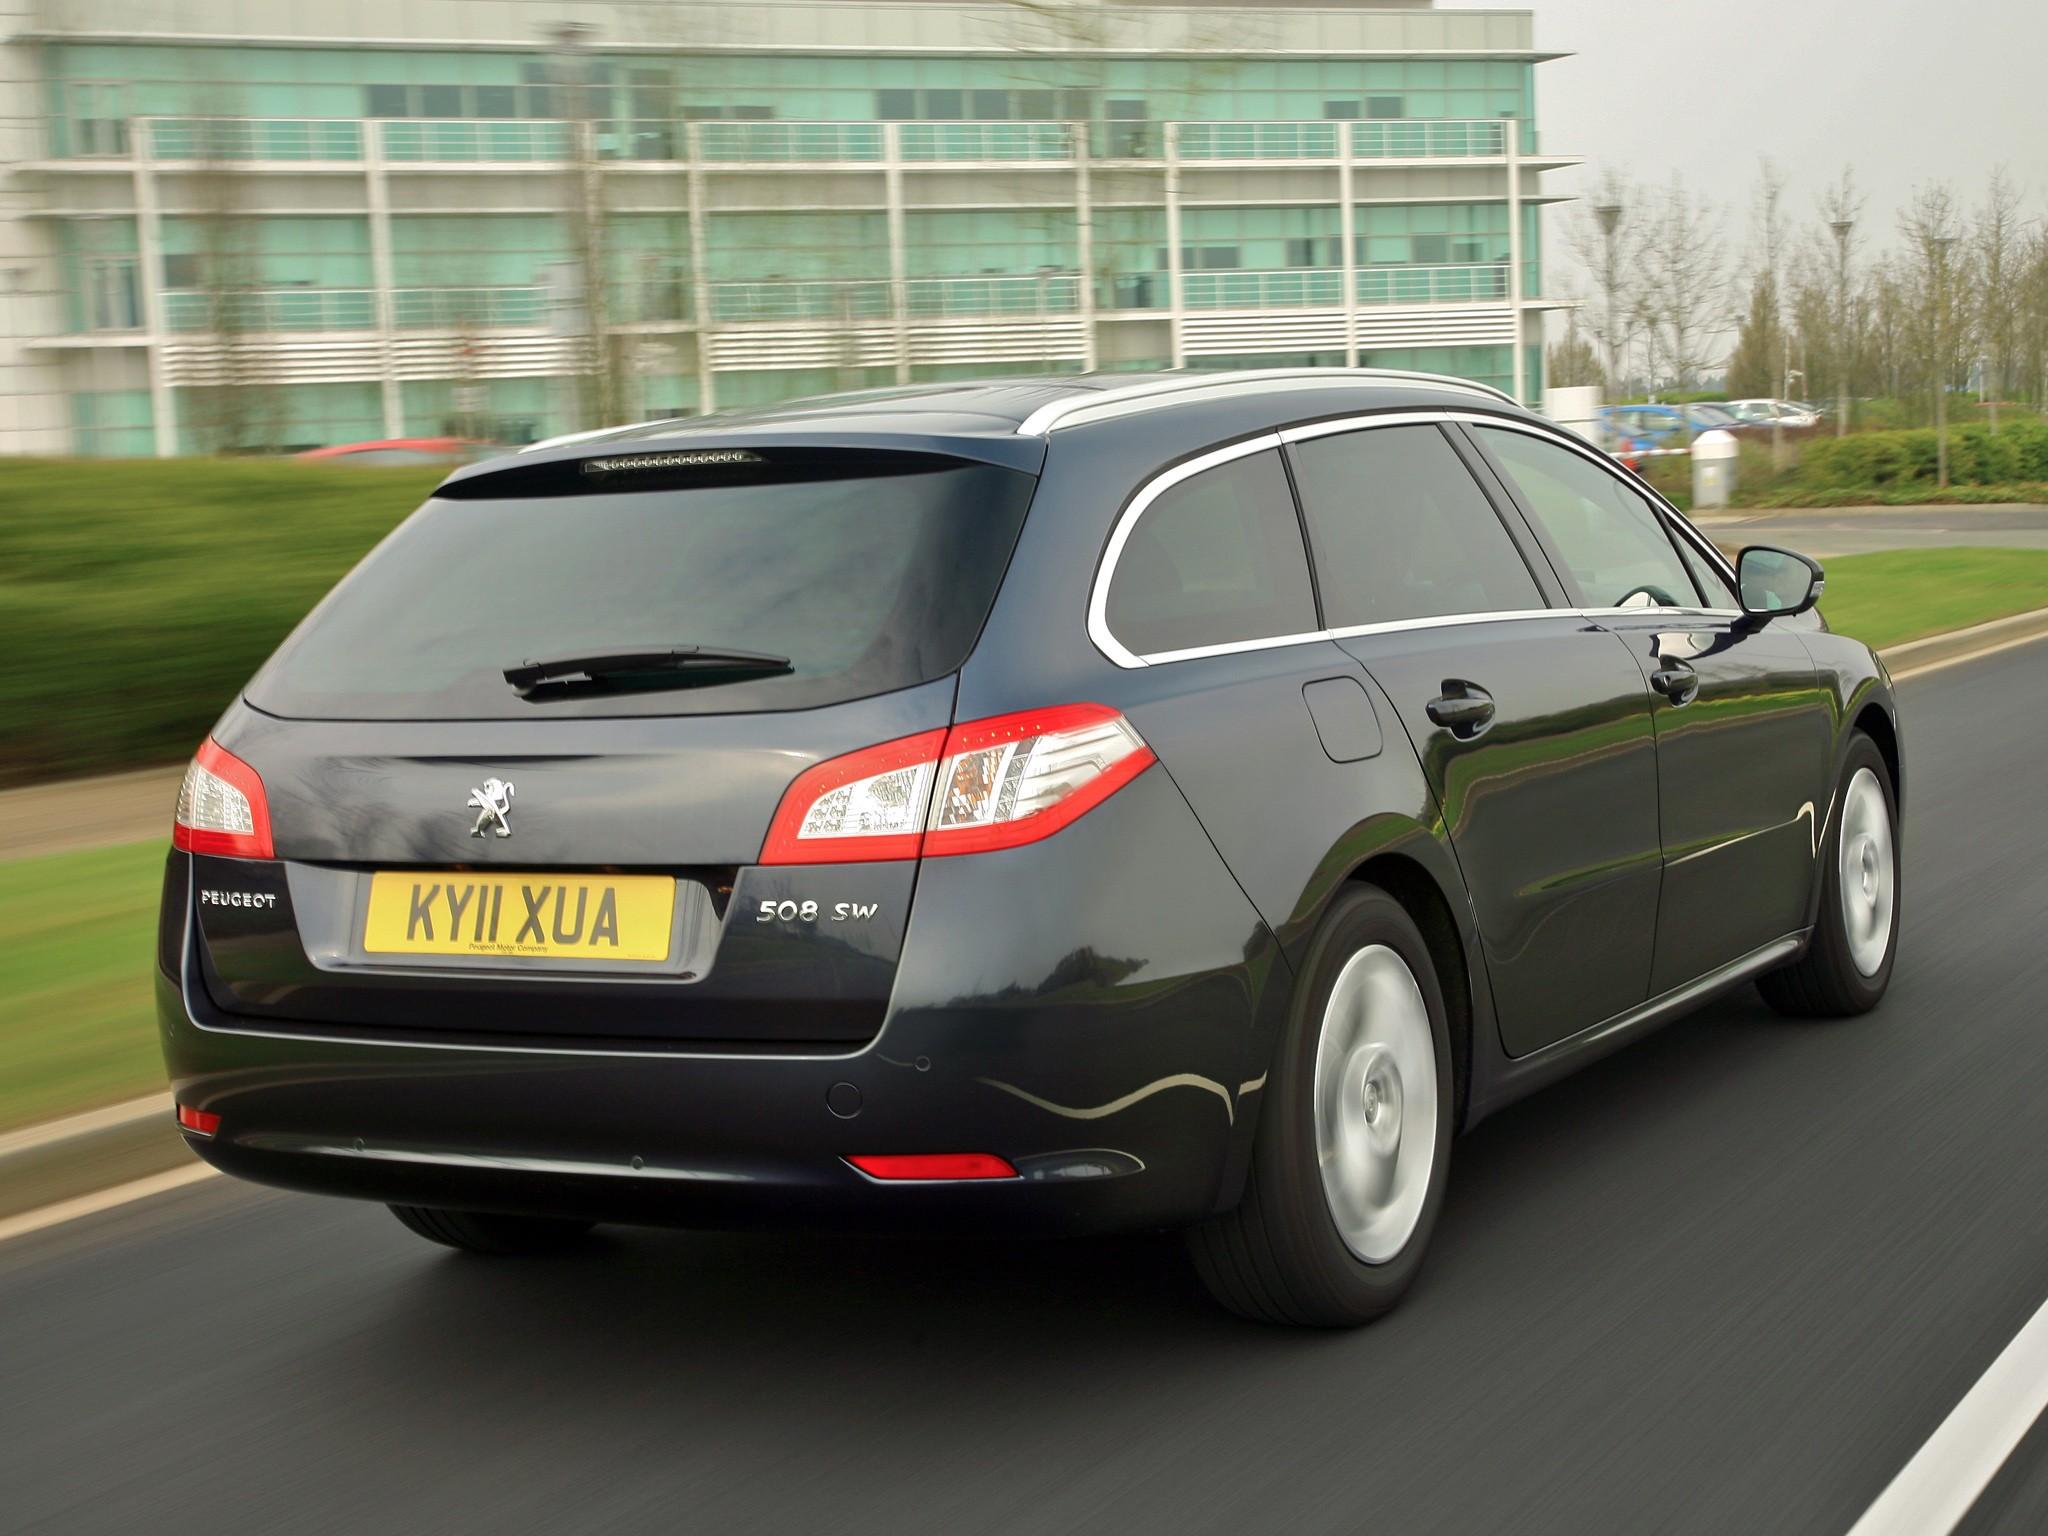 Green Auto Sales >> PEUGEOT 508 SW specs - 2010, 2011, 2012, 2013, 2014 ...